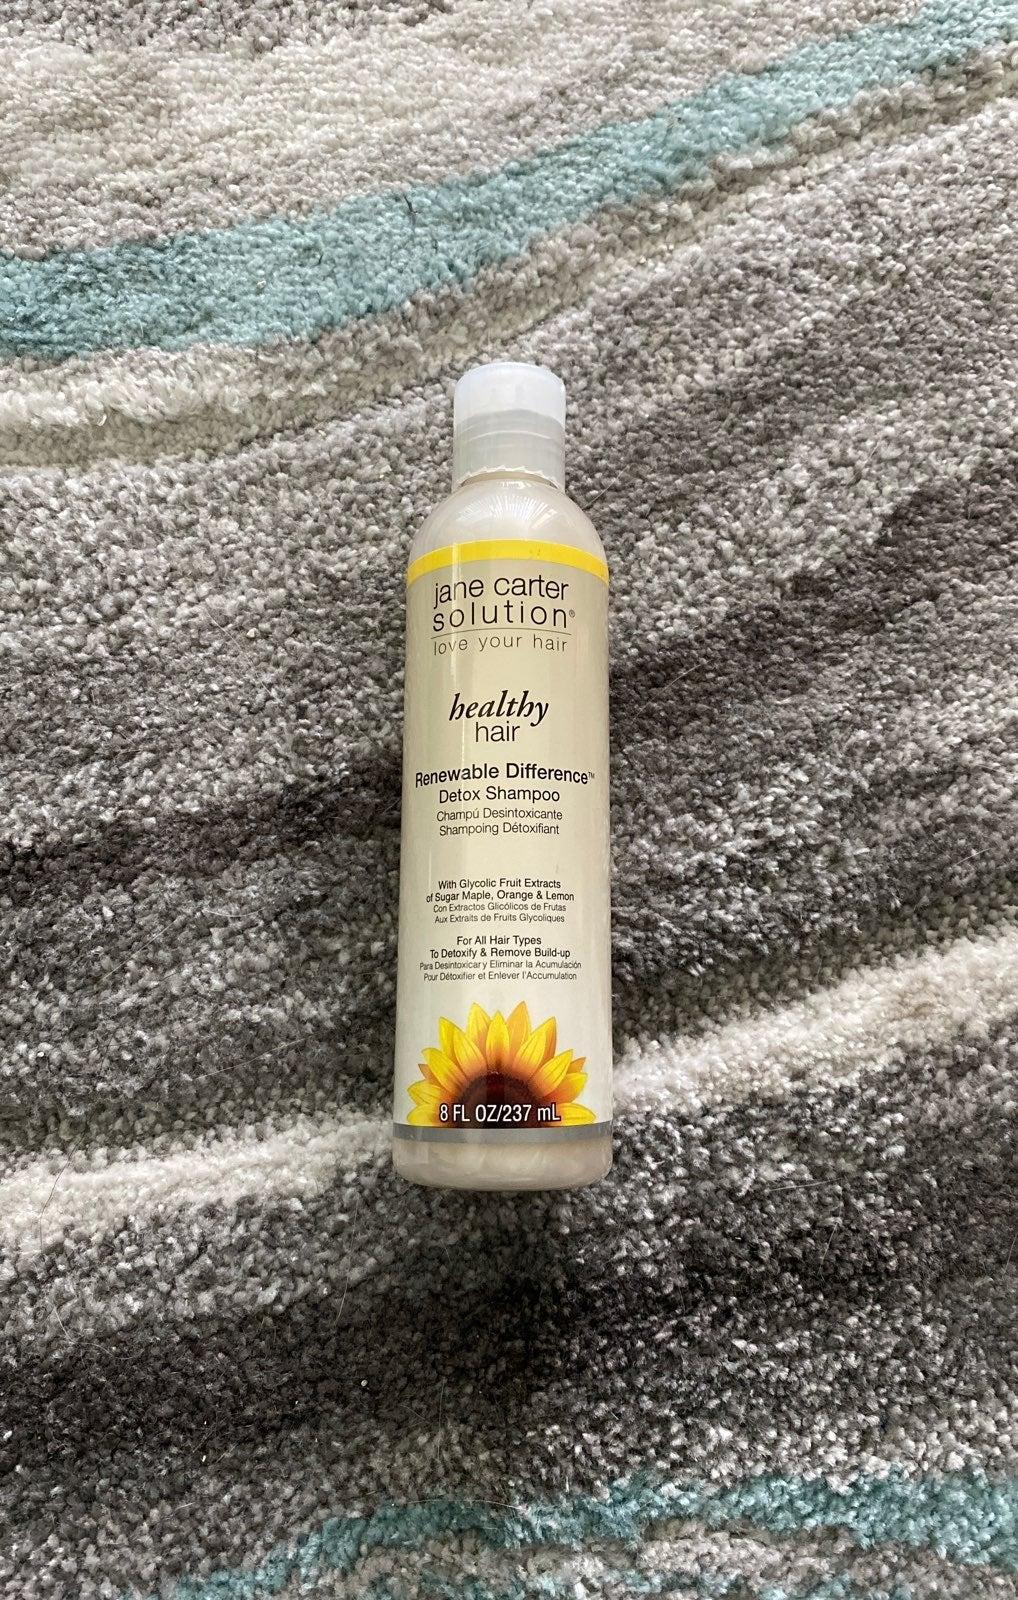 Jane Carter Solution Detox Shampoo